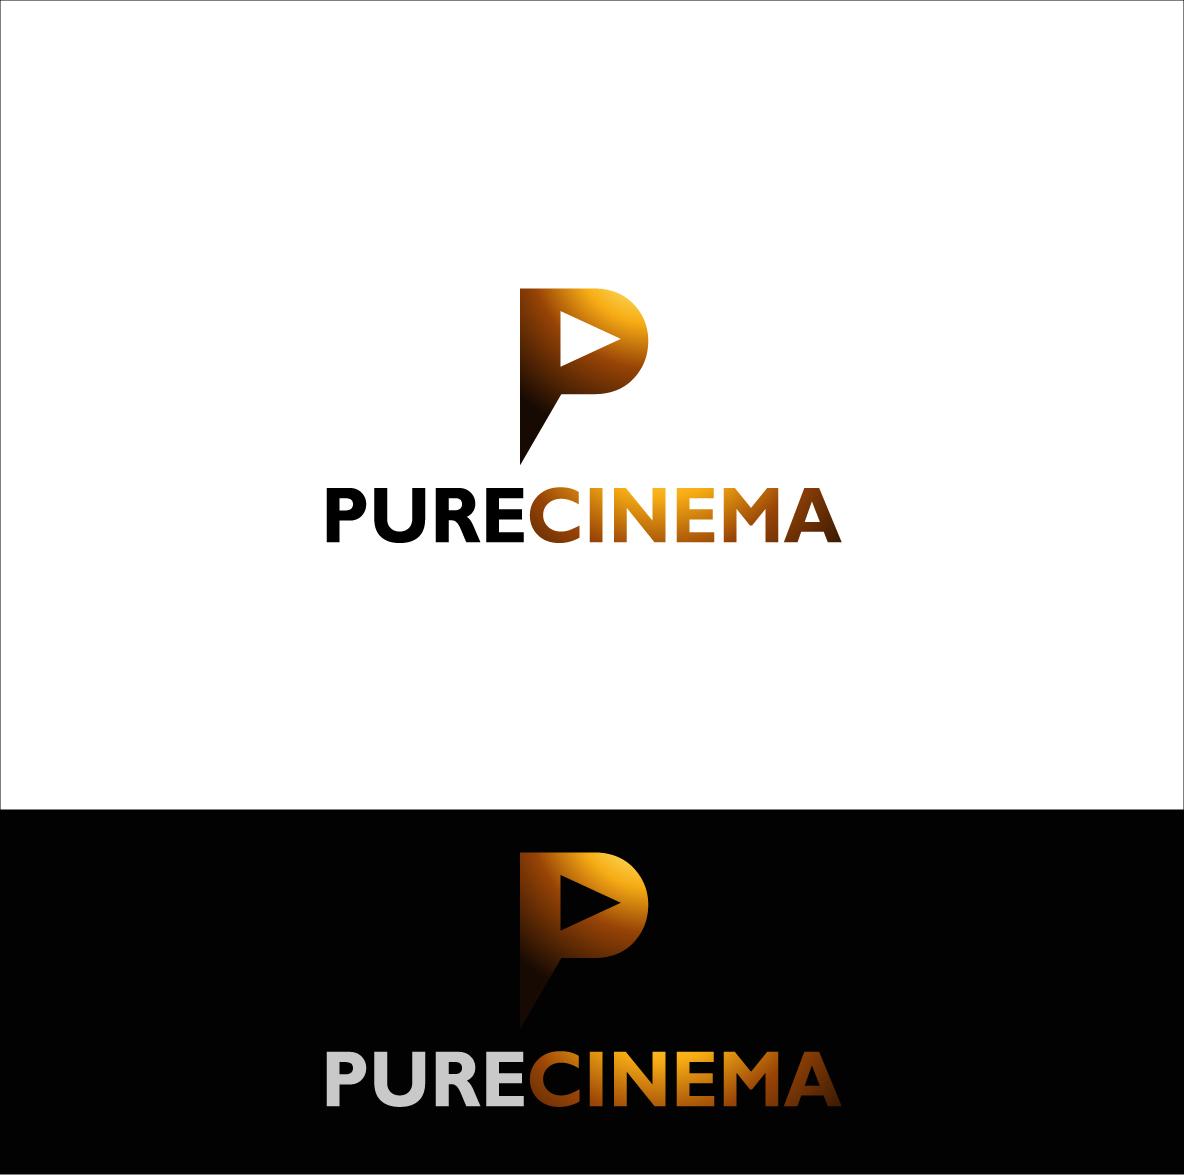 Logo Design by zoiDesign - Entry No. 108 in the Logo Design Contest Imaginative Logo Design for Pure Cinema.